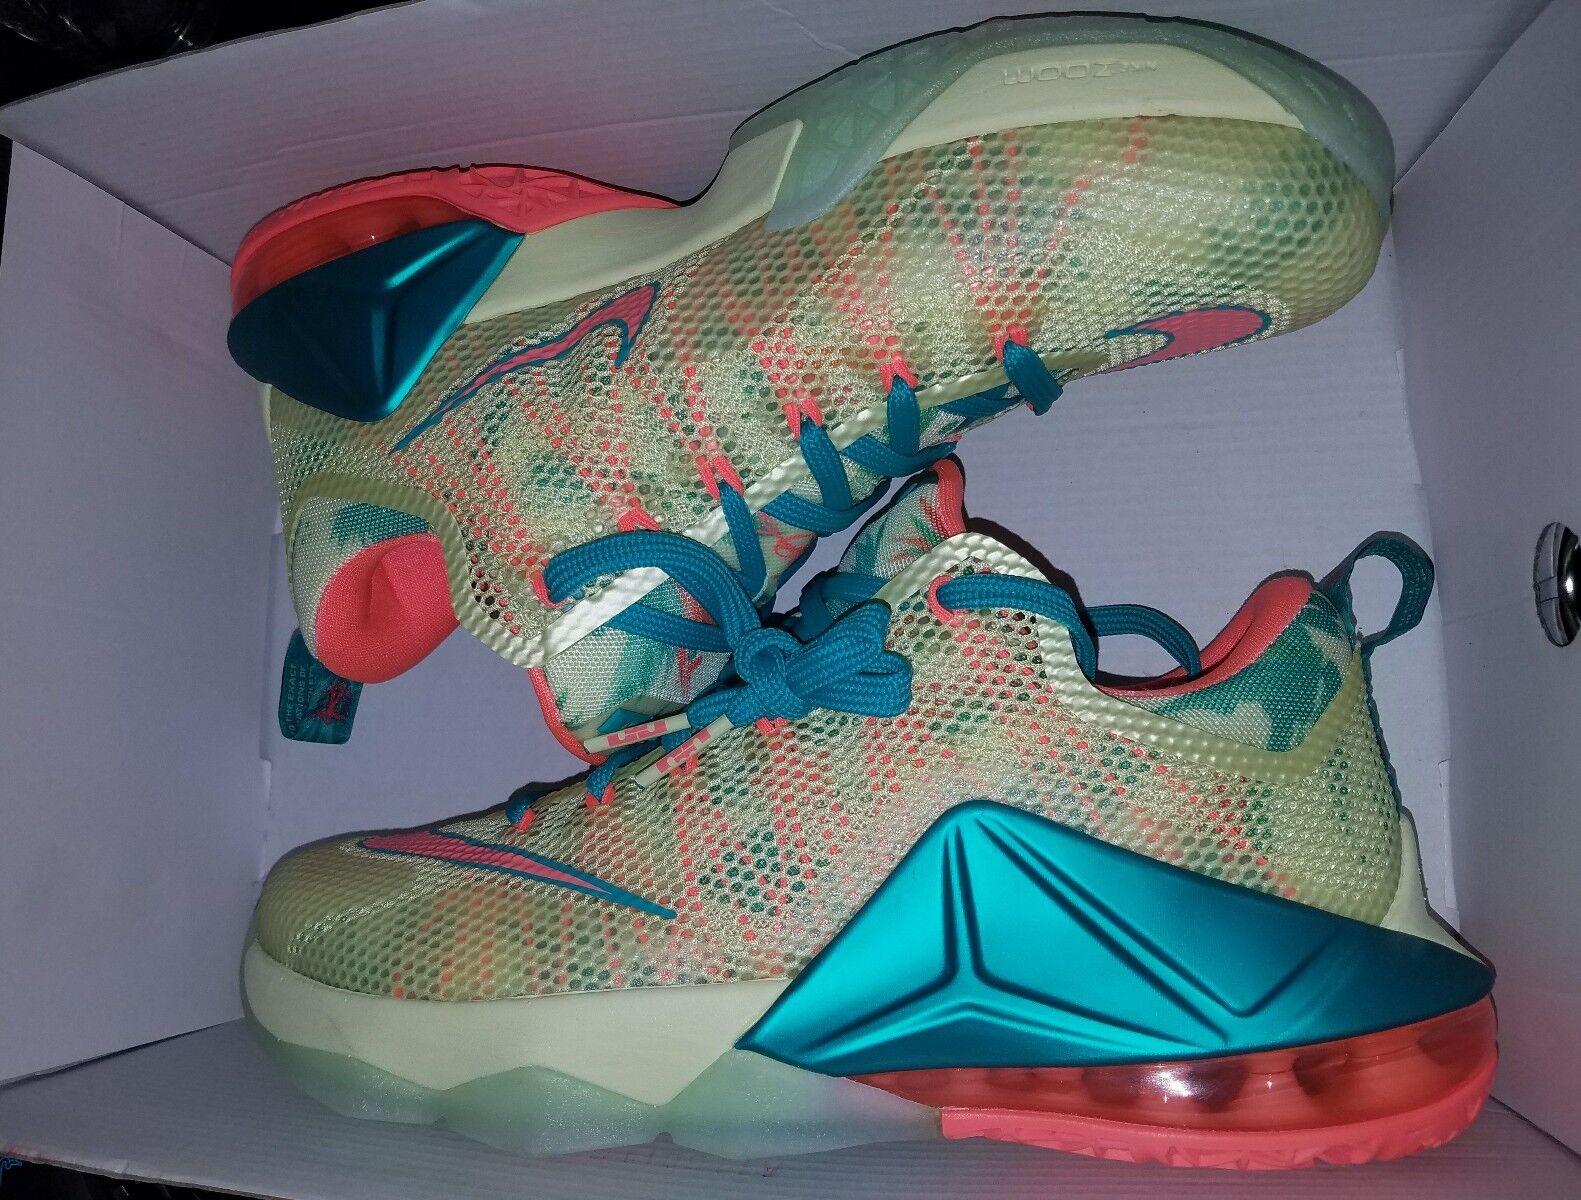 Nike lebron 12 low prm lebronald palmer south beach pre heat asg mvp 3 rings